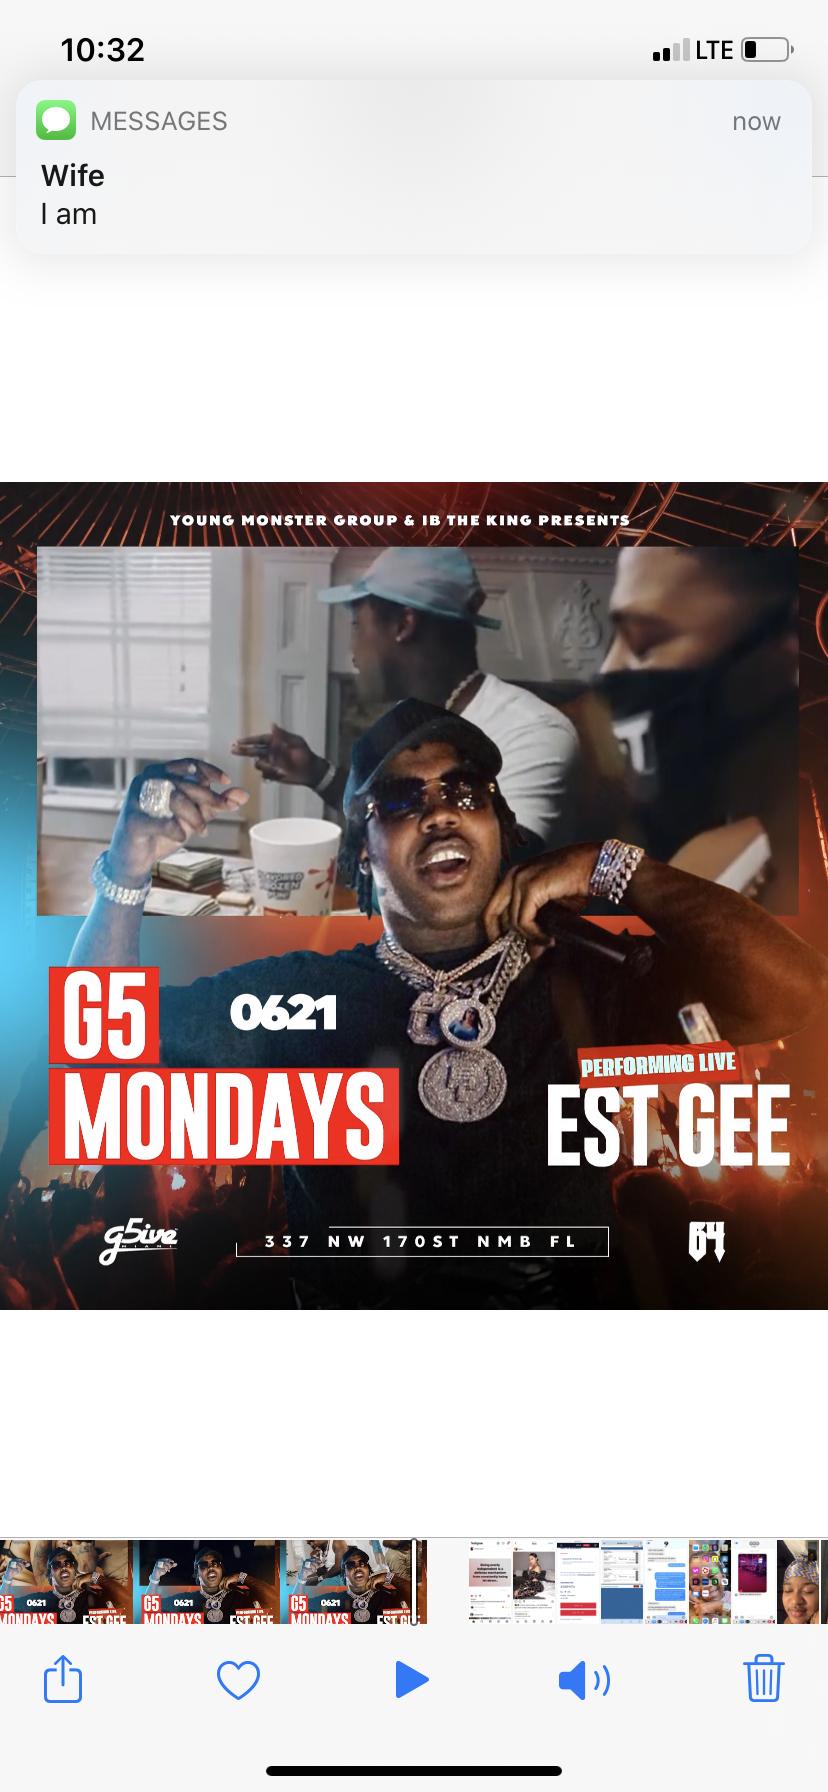 Est Gee Performing Live @ G5 Miami